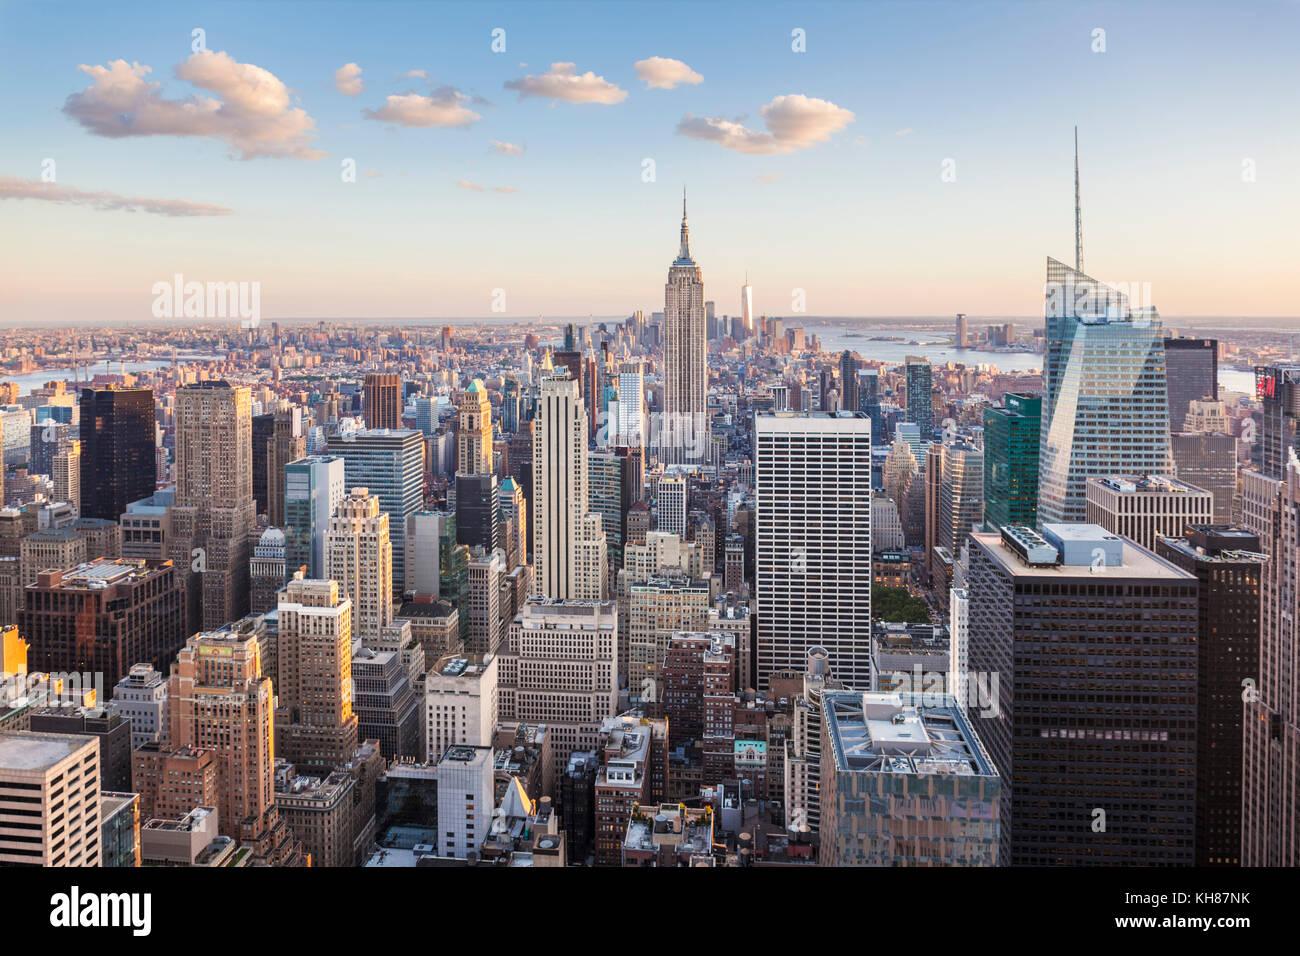 view of the Manhattan skyline, New York Skyline, Empire State Building, New York City, United States of America, - Stock Image